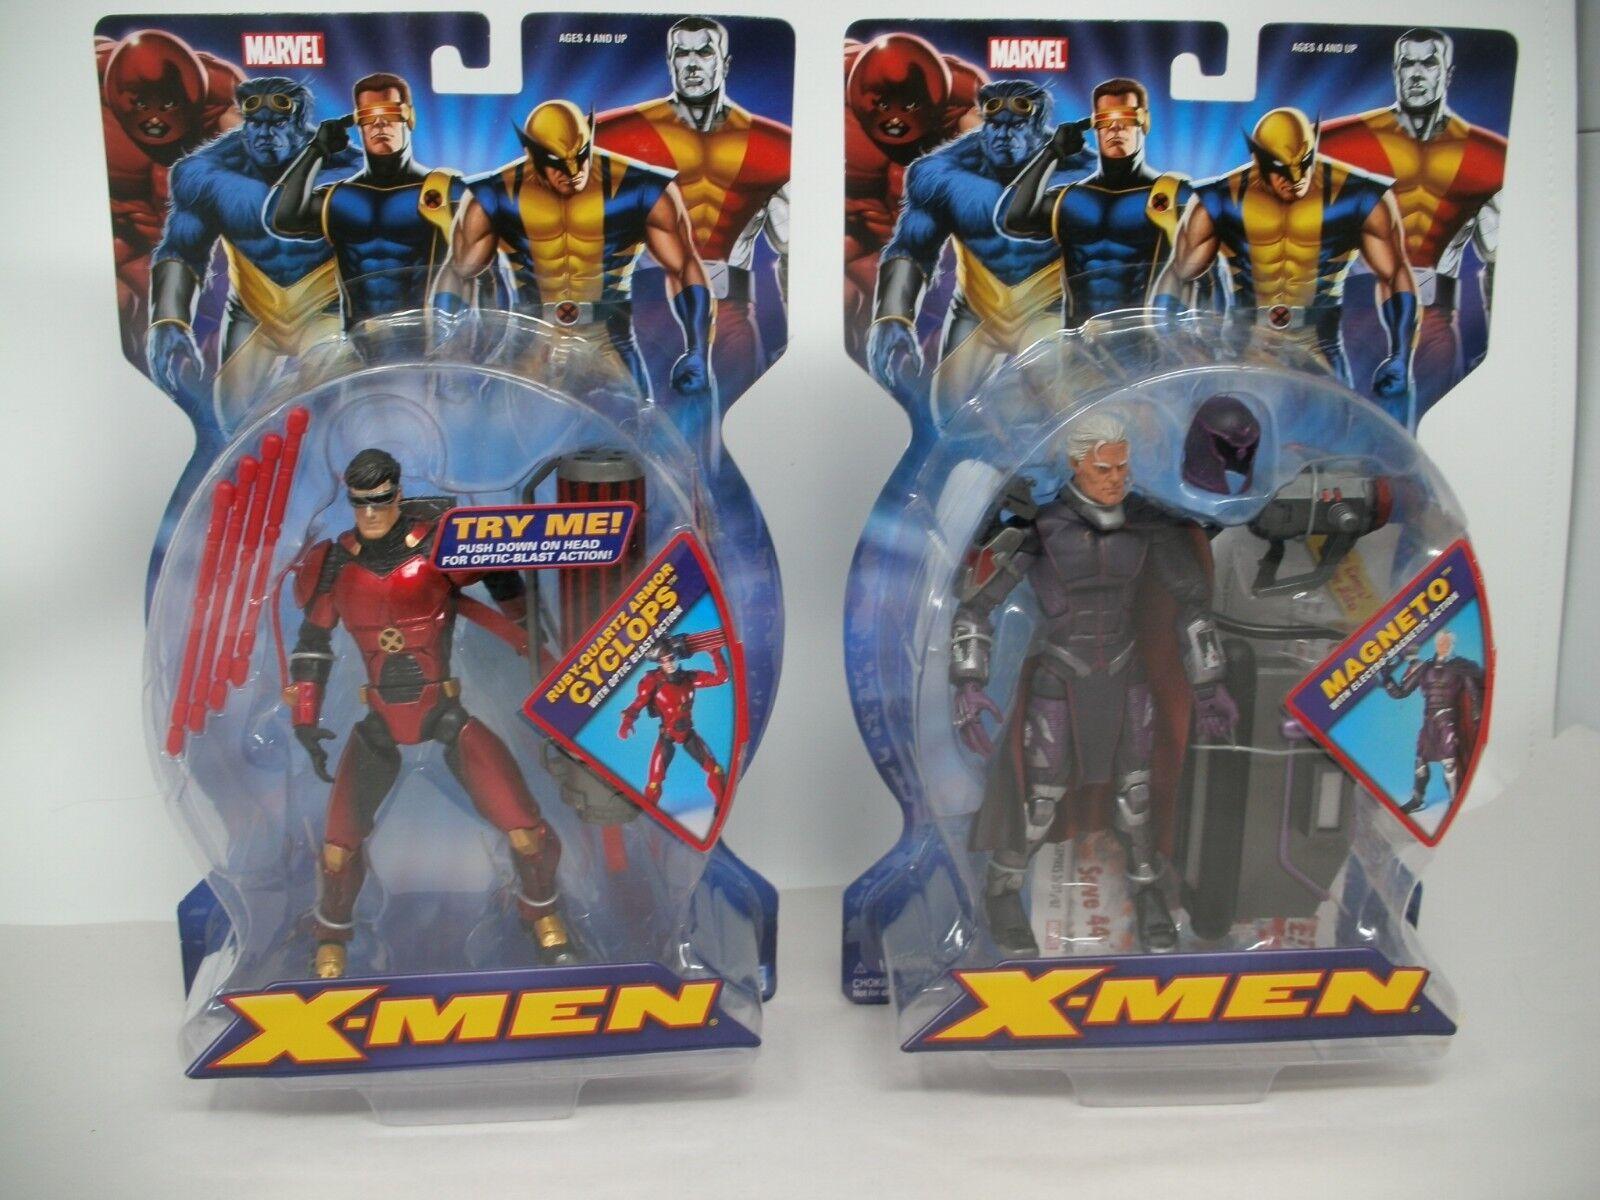 2005 Toy Toy Toy Biz Marvel Legends X-Men Lot - Magneto and Cyclops Ruby Quartz  MOC 849b6b